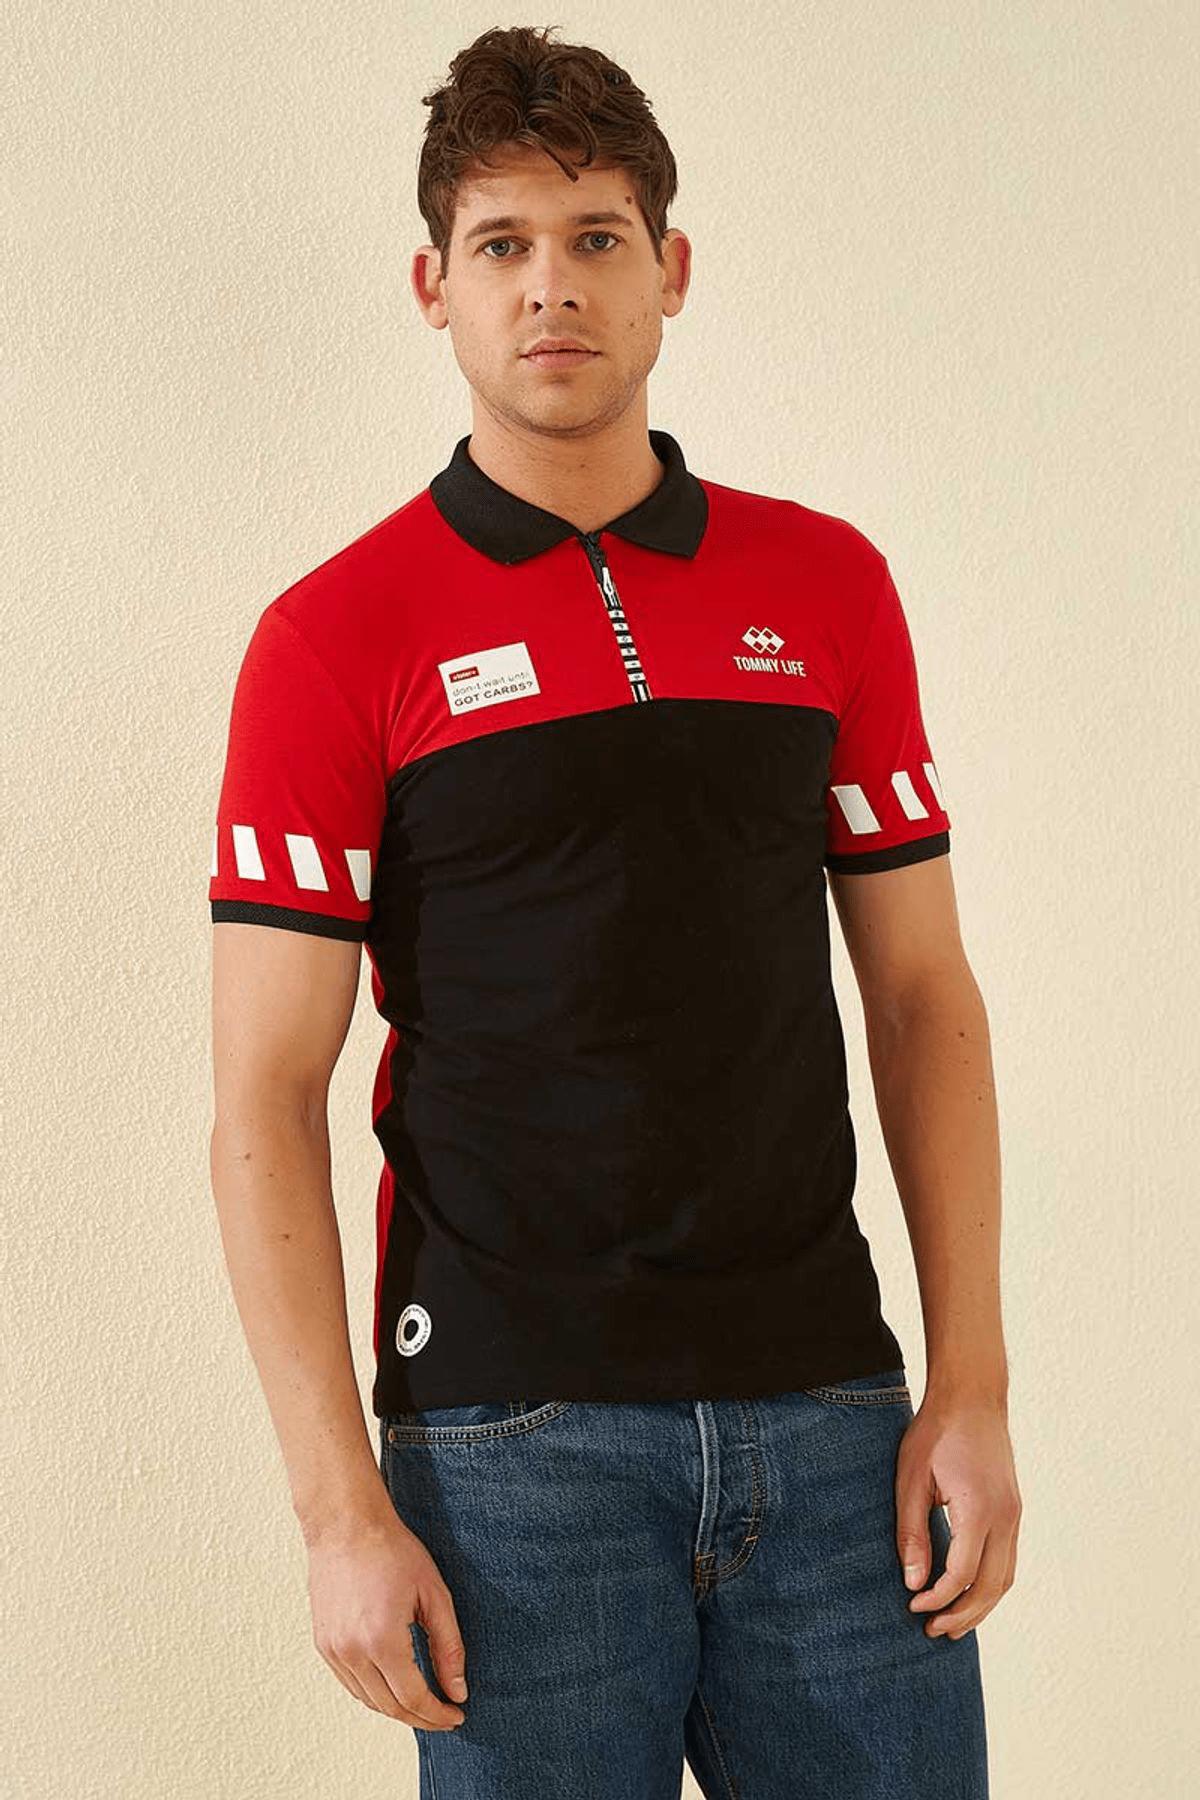 Tommy Life Kol Detaylı Polo Yaka Kırmızı Erkek T-Shirt T08ER-87800_1 4